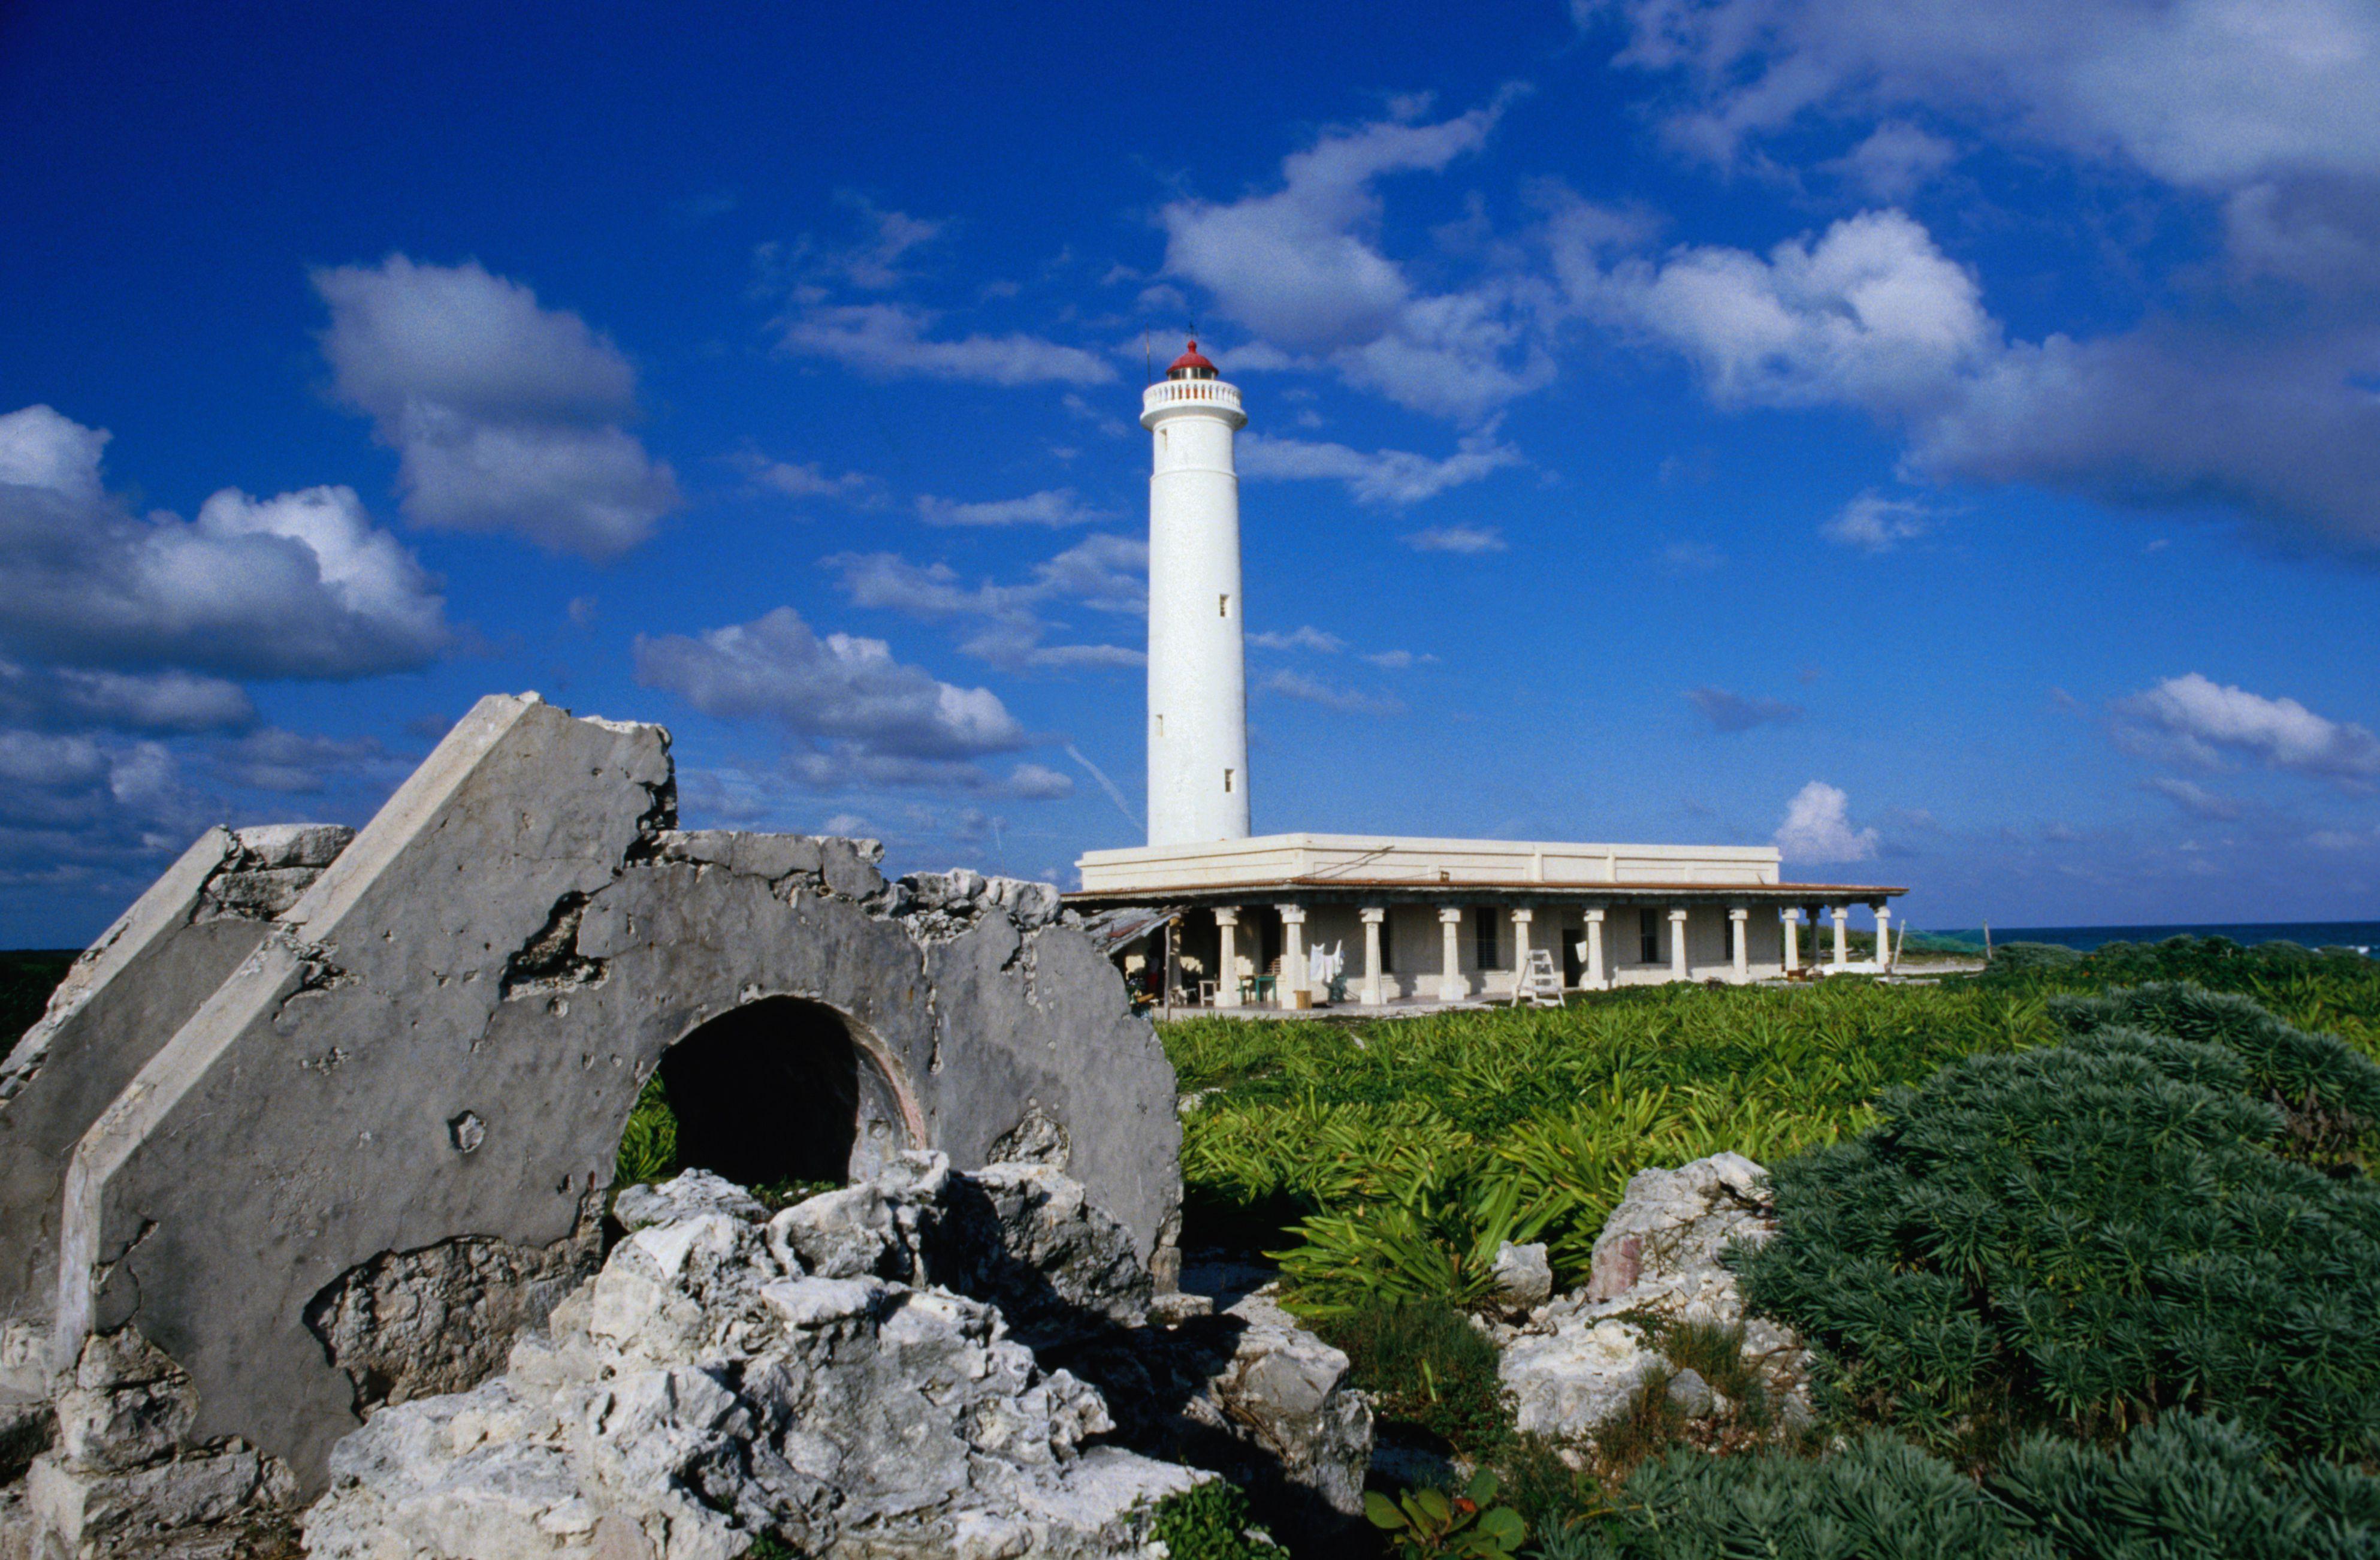 Lighthouse on the island of Cozumel